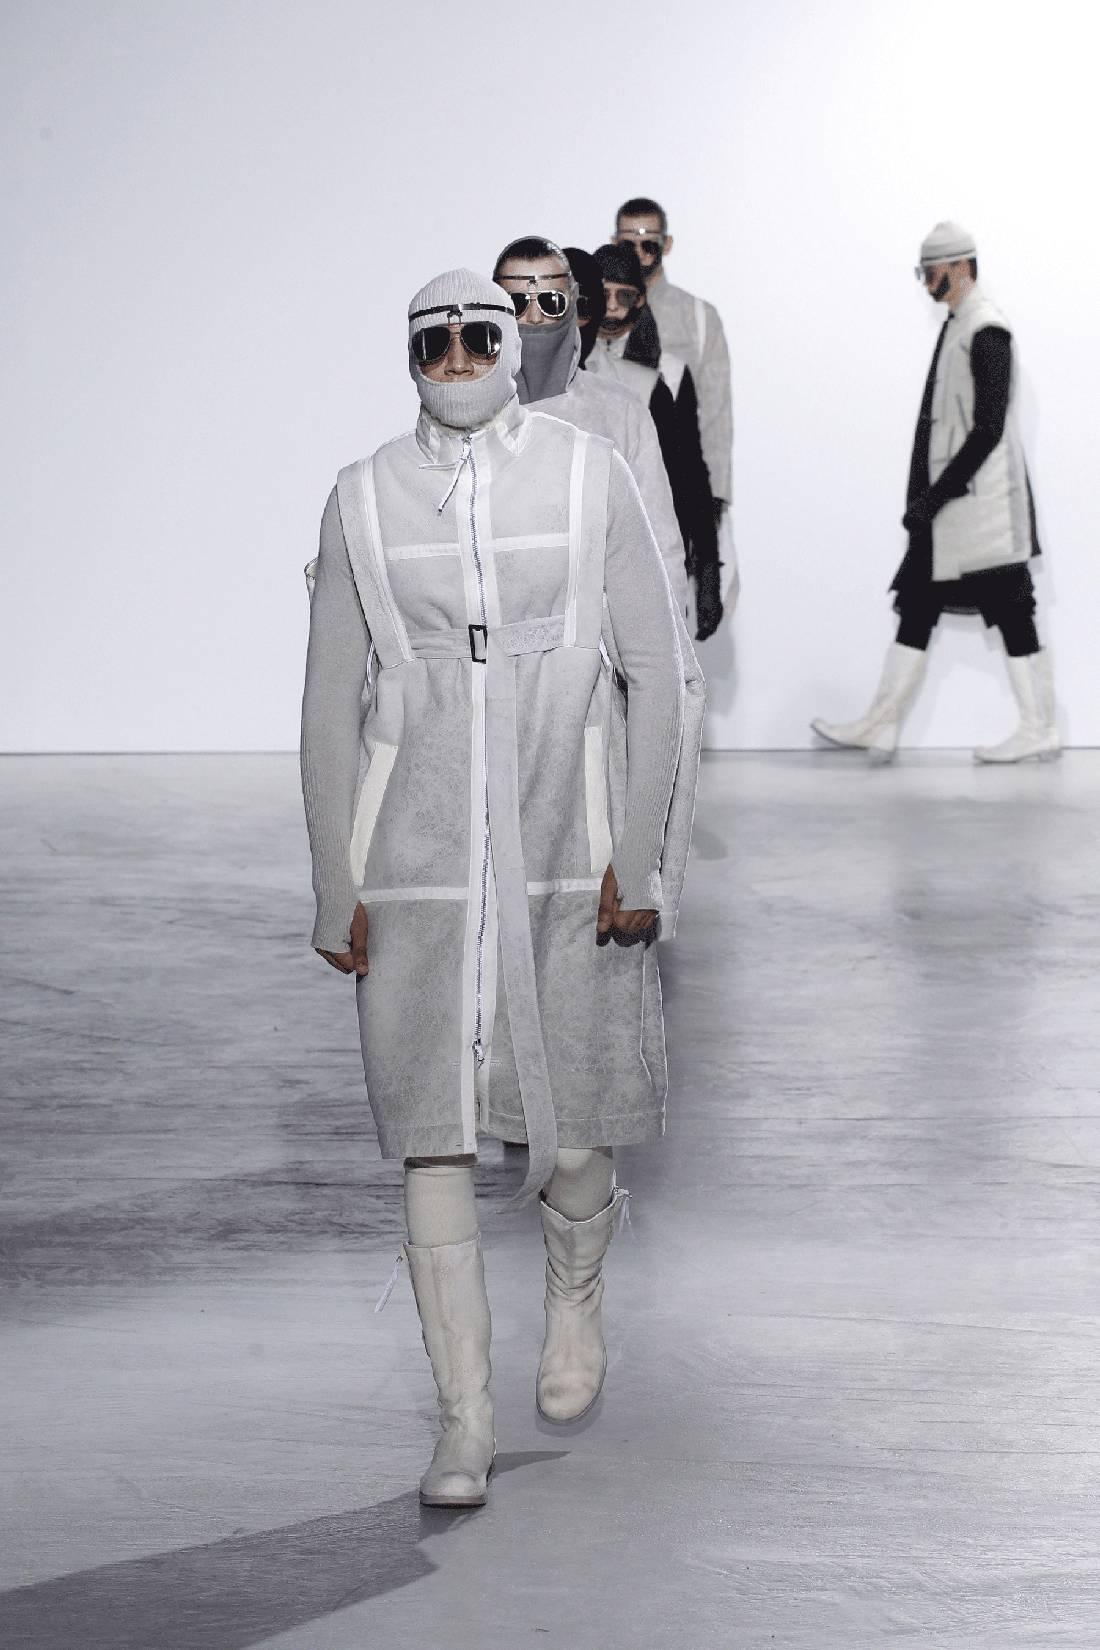 aviator sunglasses designer  while aviator